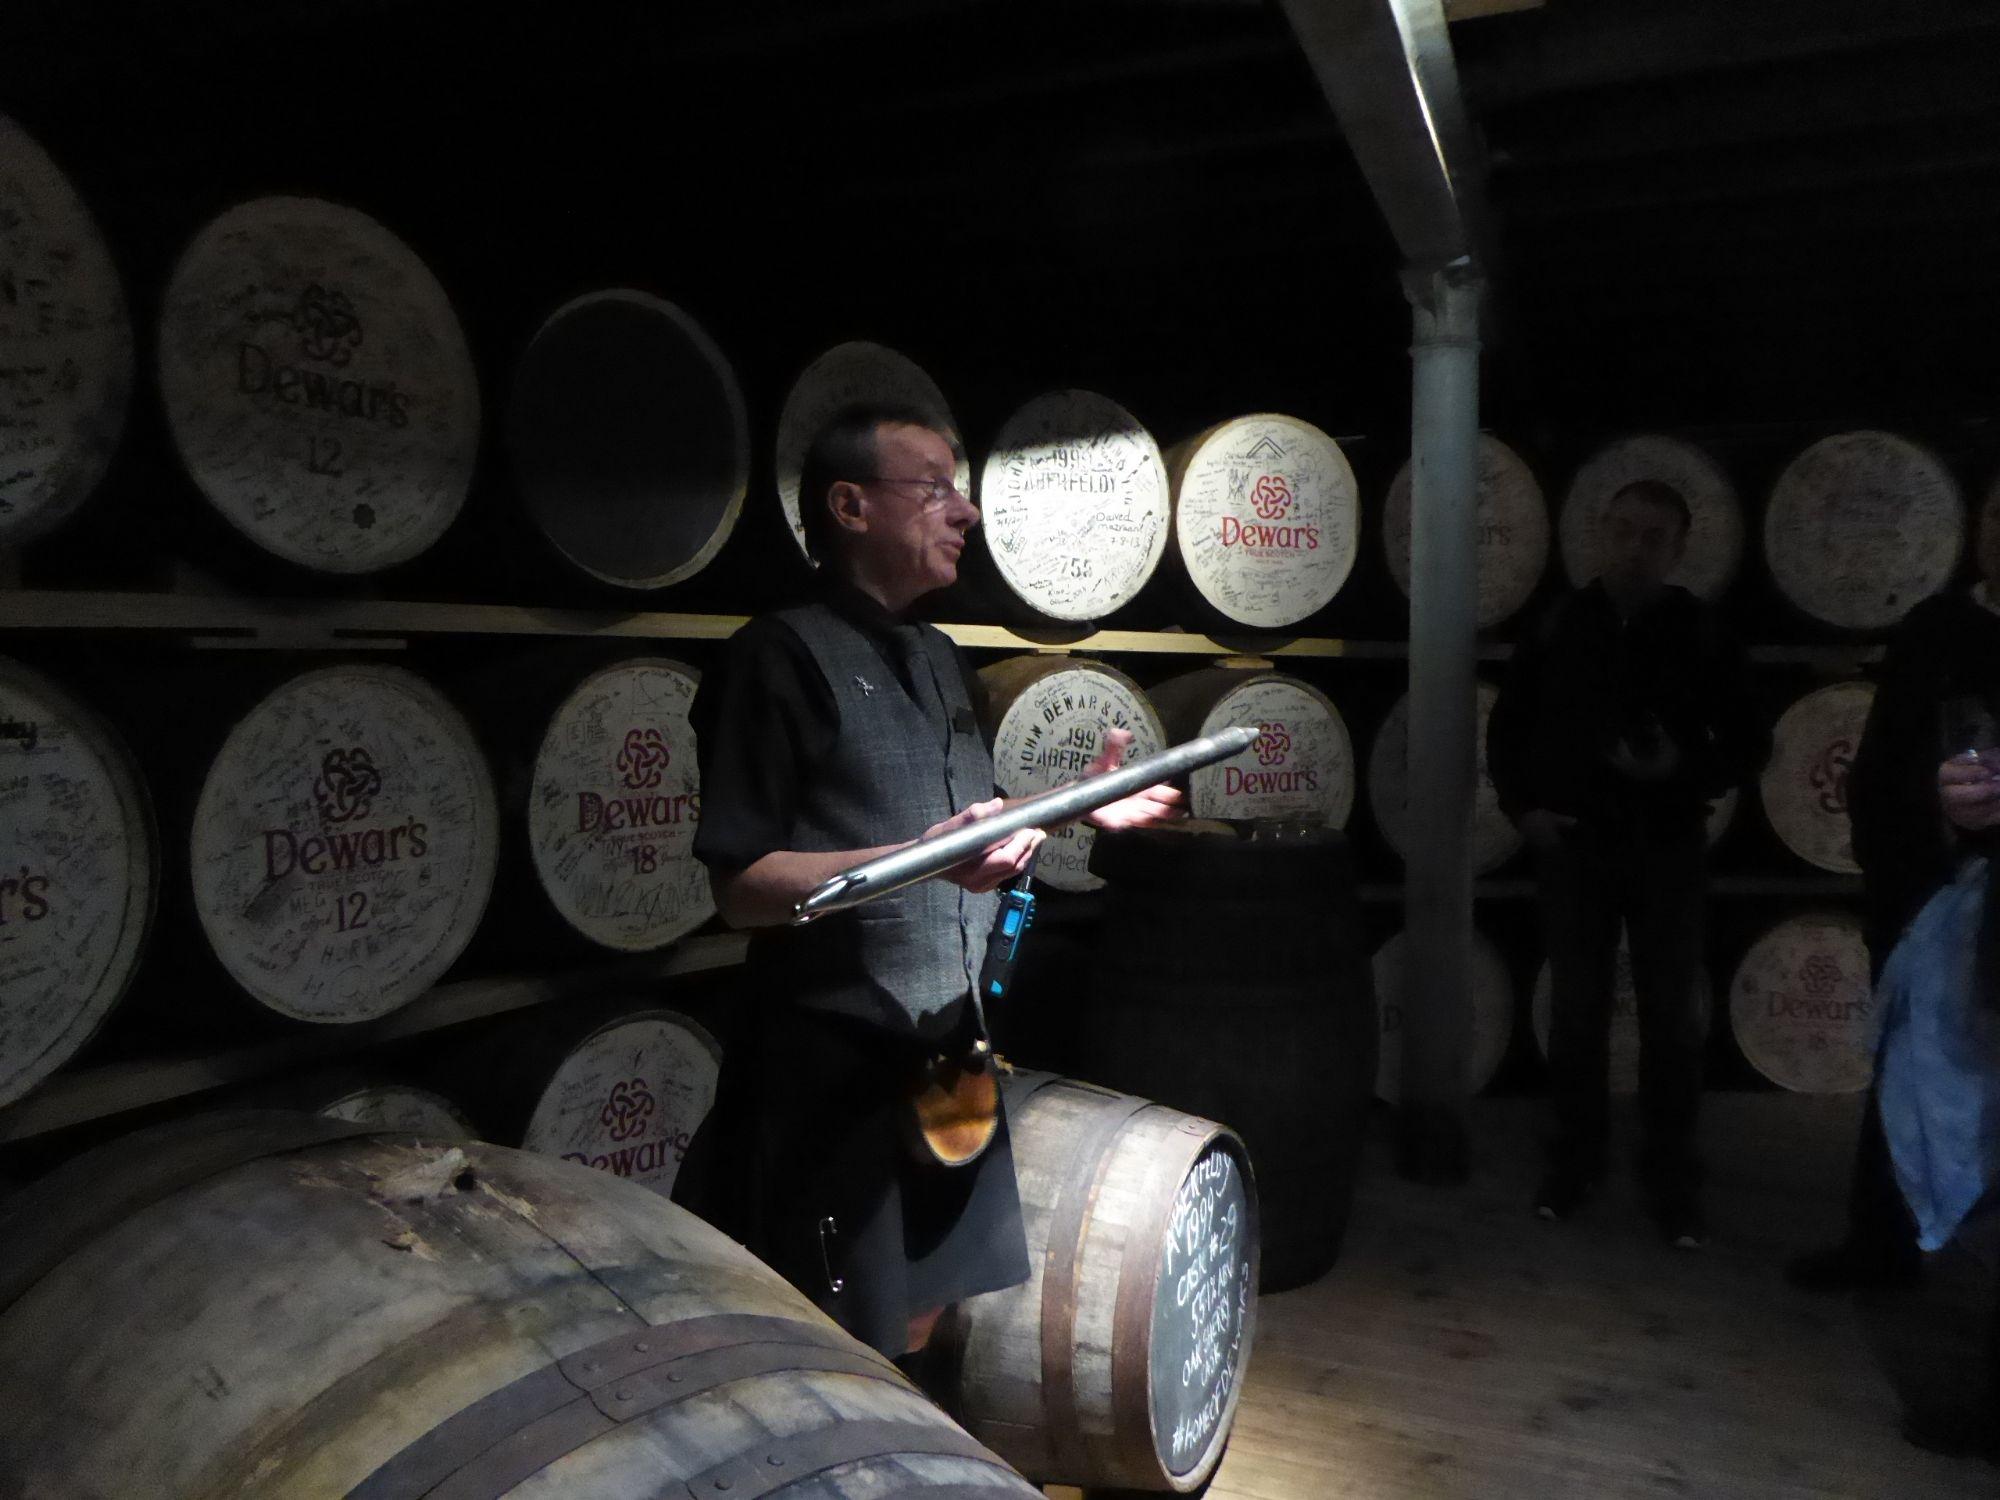 Dewar whisky tasting